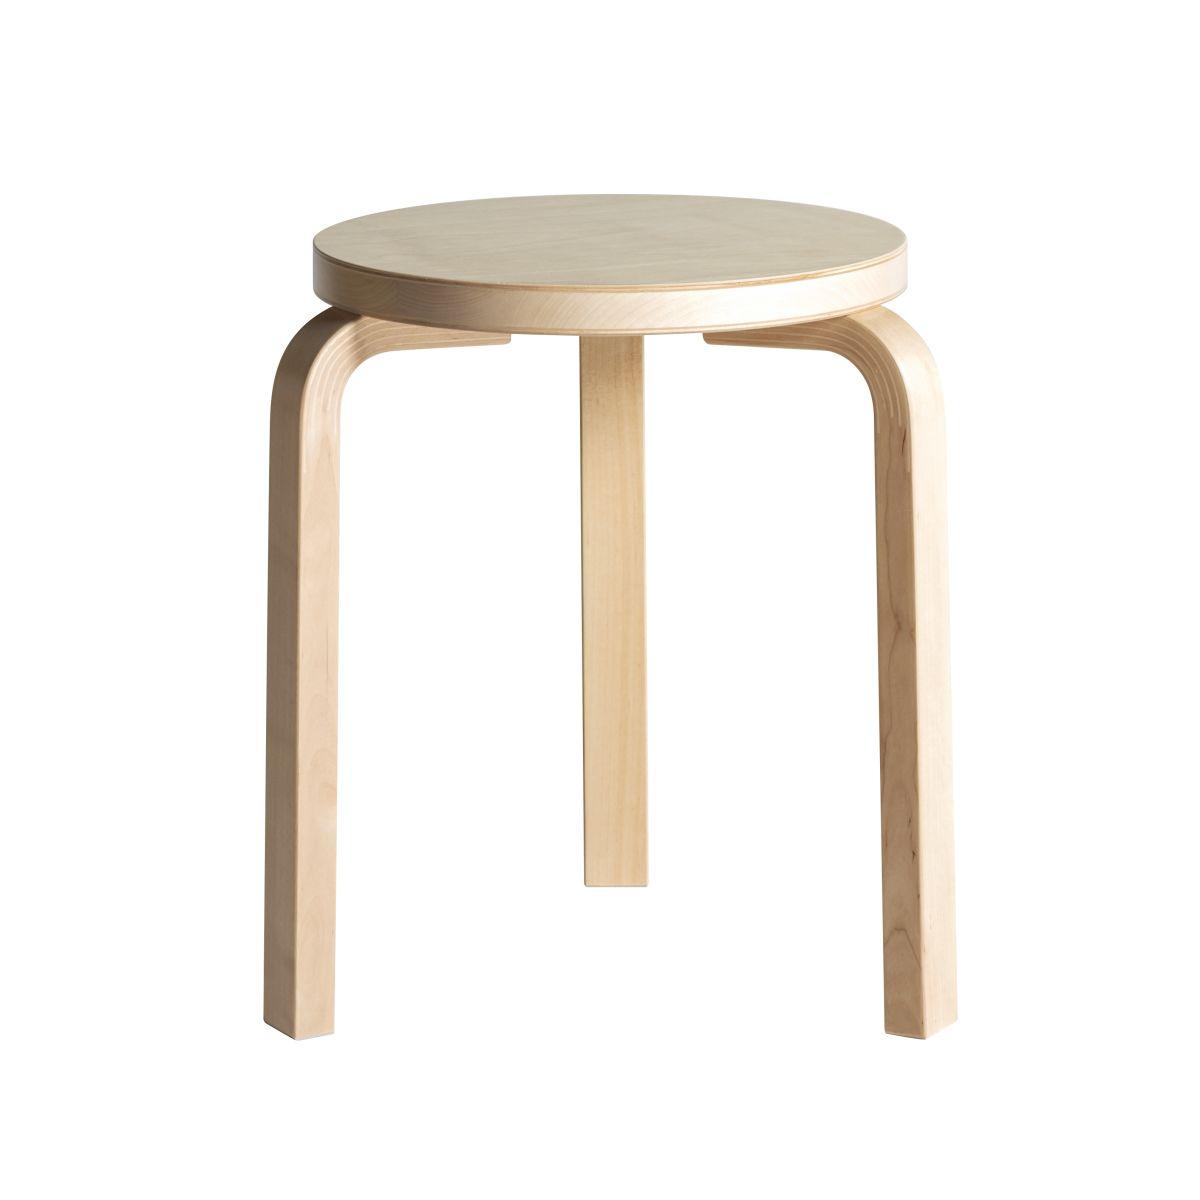 Amazing Artek Stool 60 Beatyapartments Chair Design Images Beatyapartmentscom